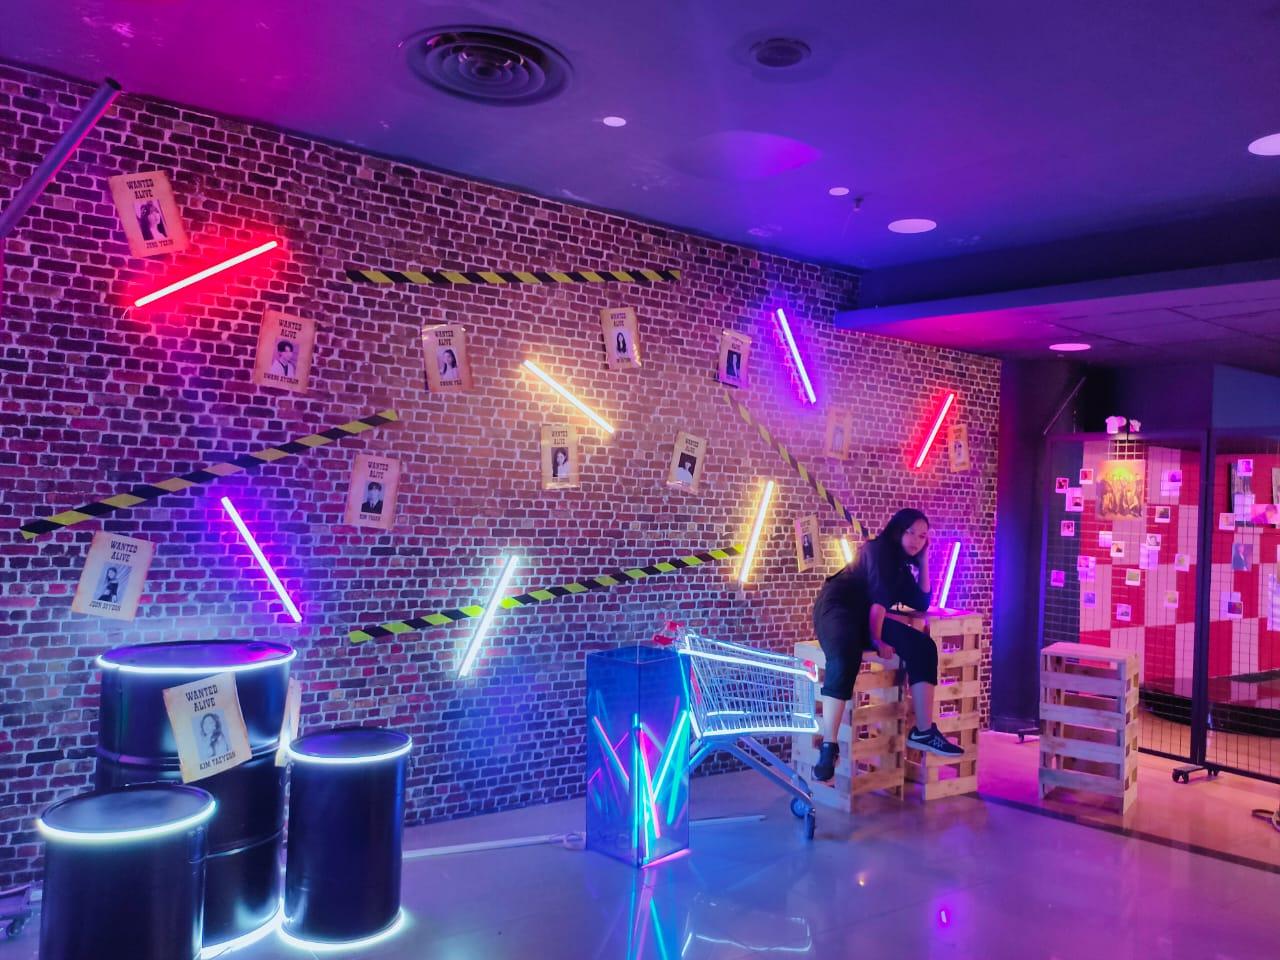 Menikmati Budaya Korea di Zona Korea CREATIVE space